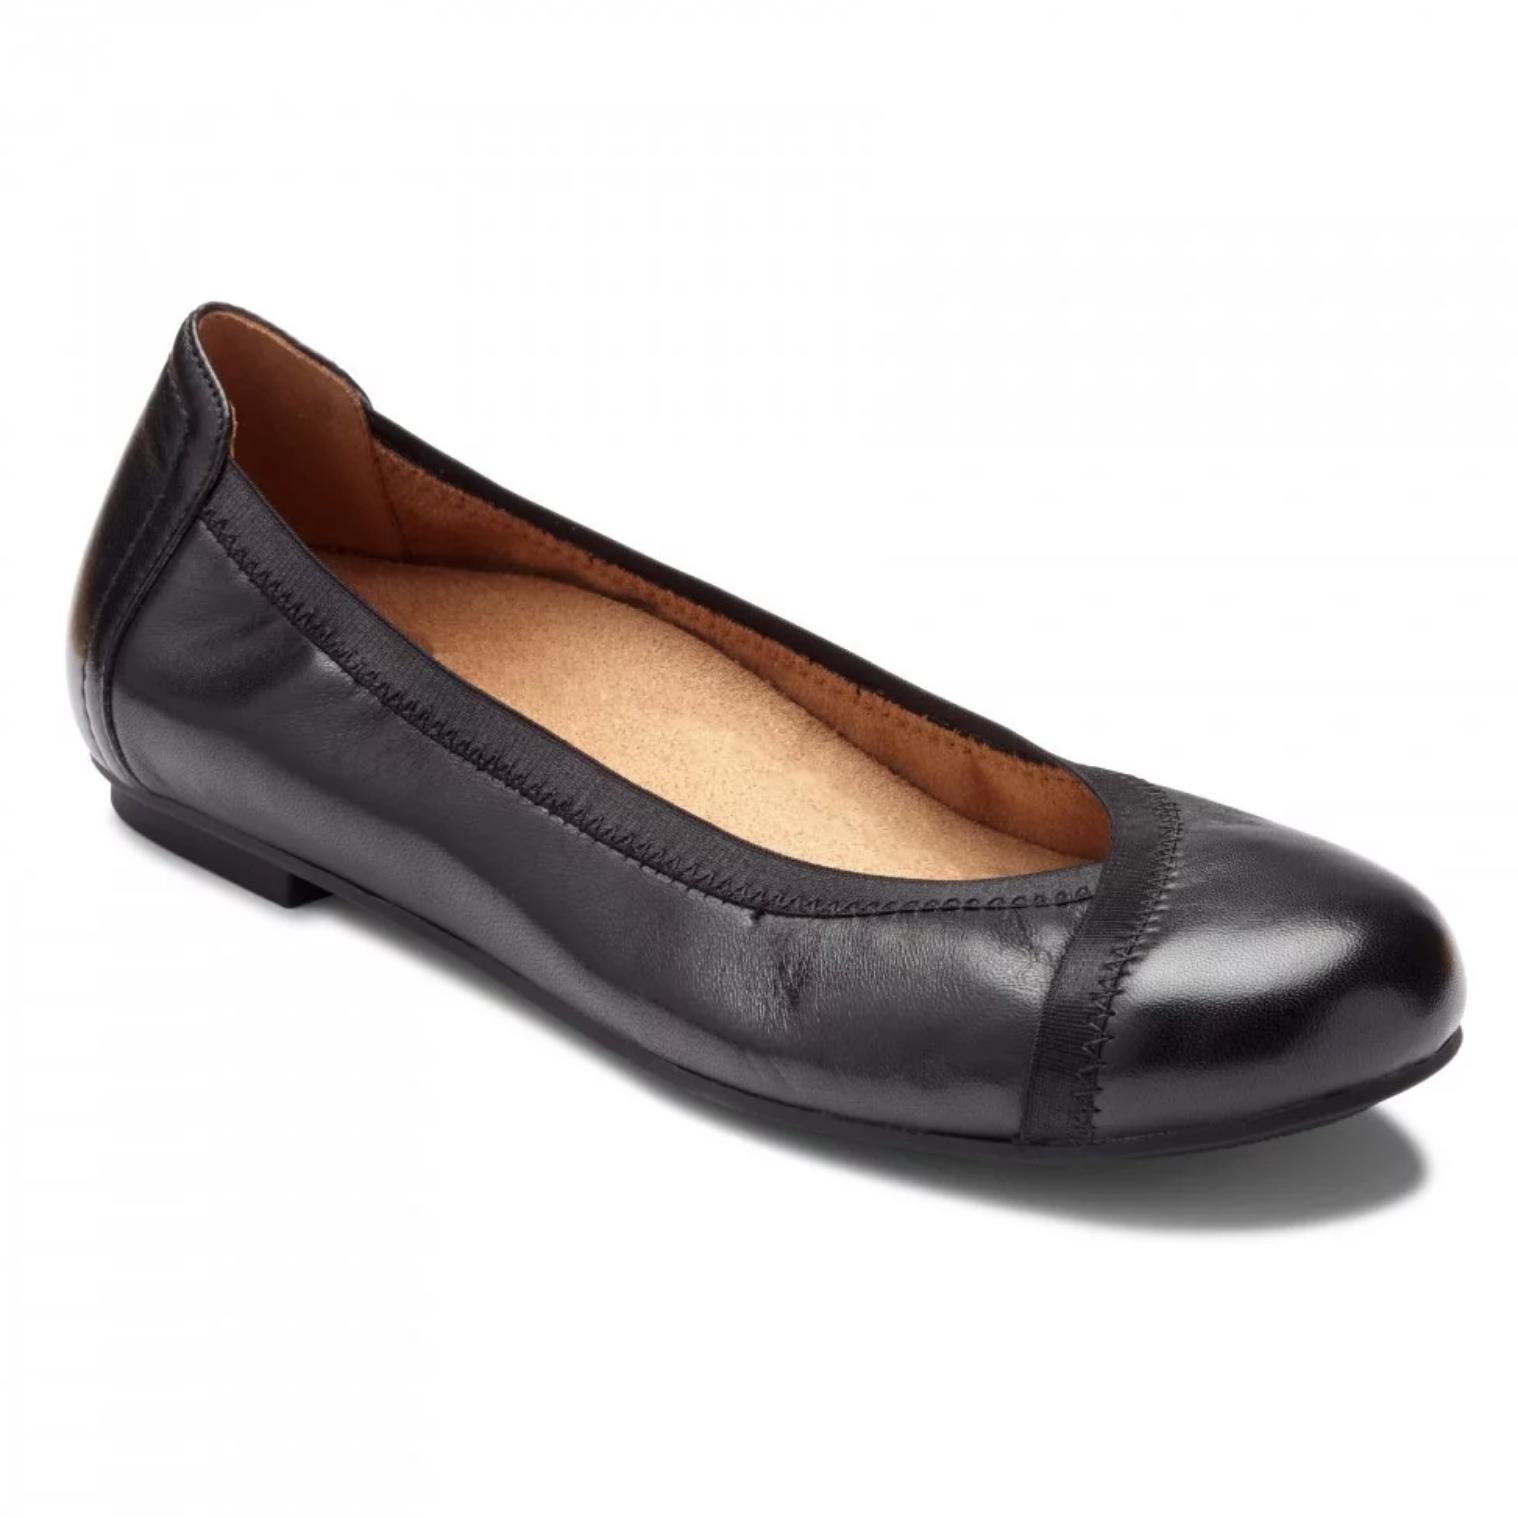 e36d2c3352d Vionic Women s Caroll Ballet Flat Black Leather